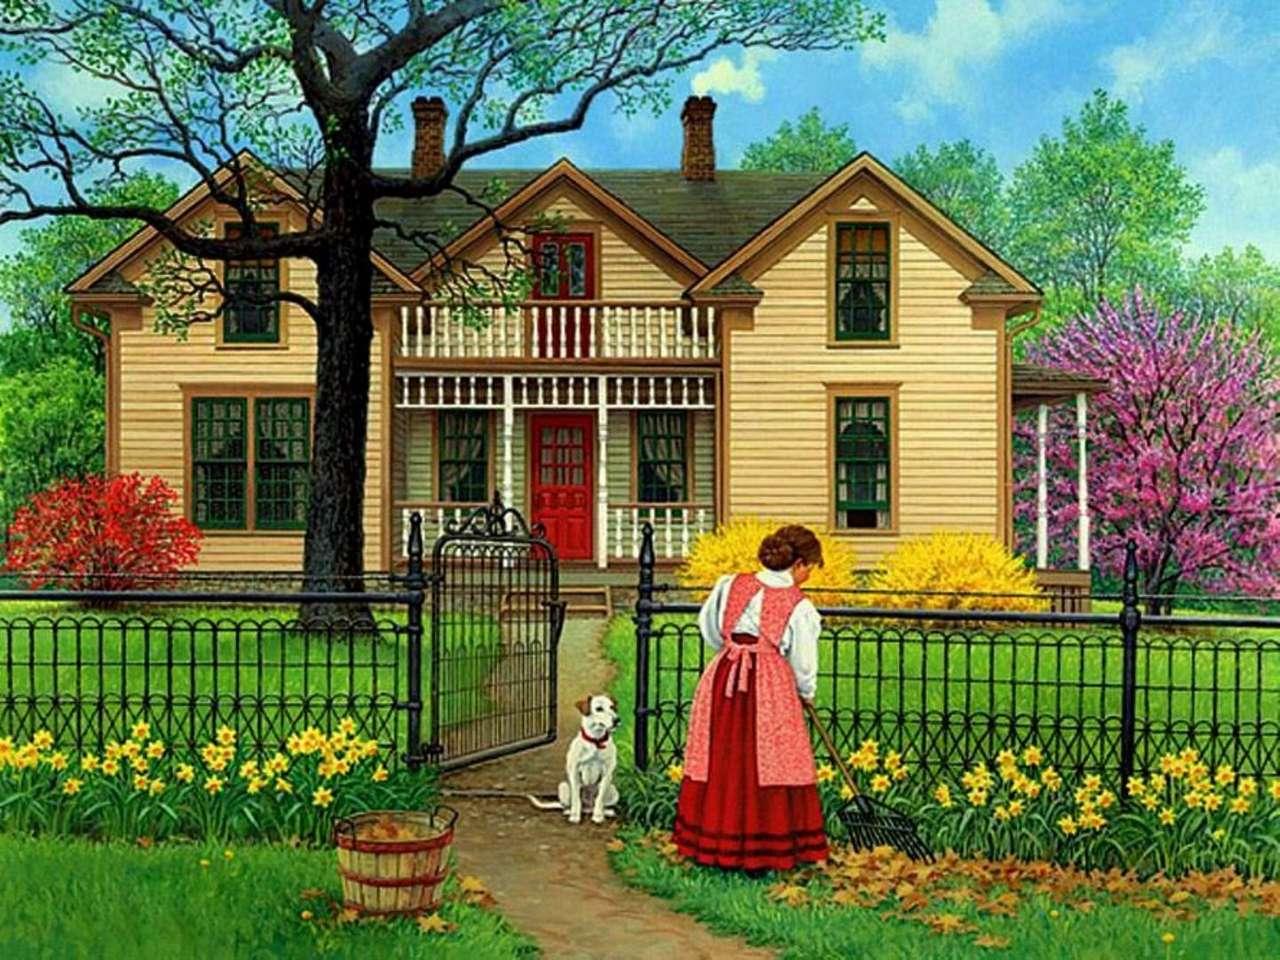 Huis met tuin (12×9)